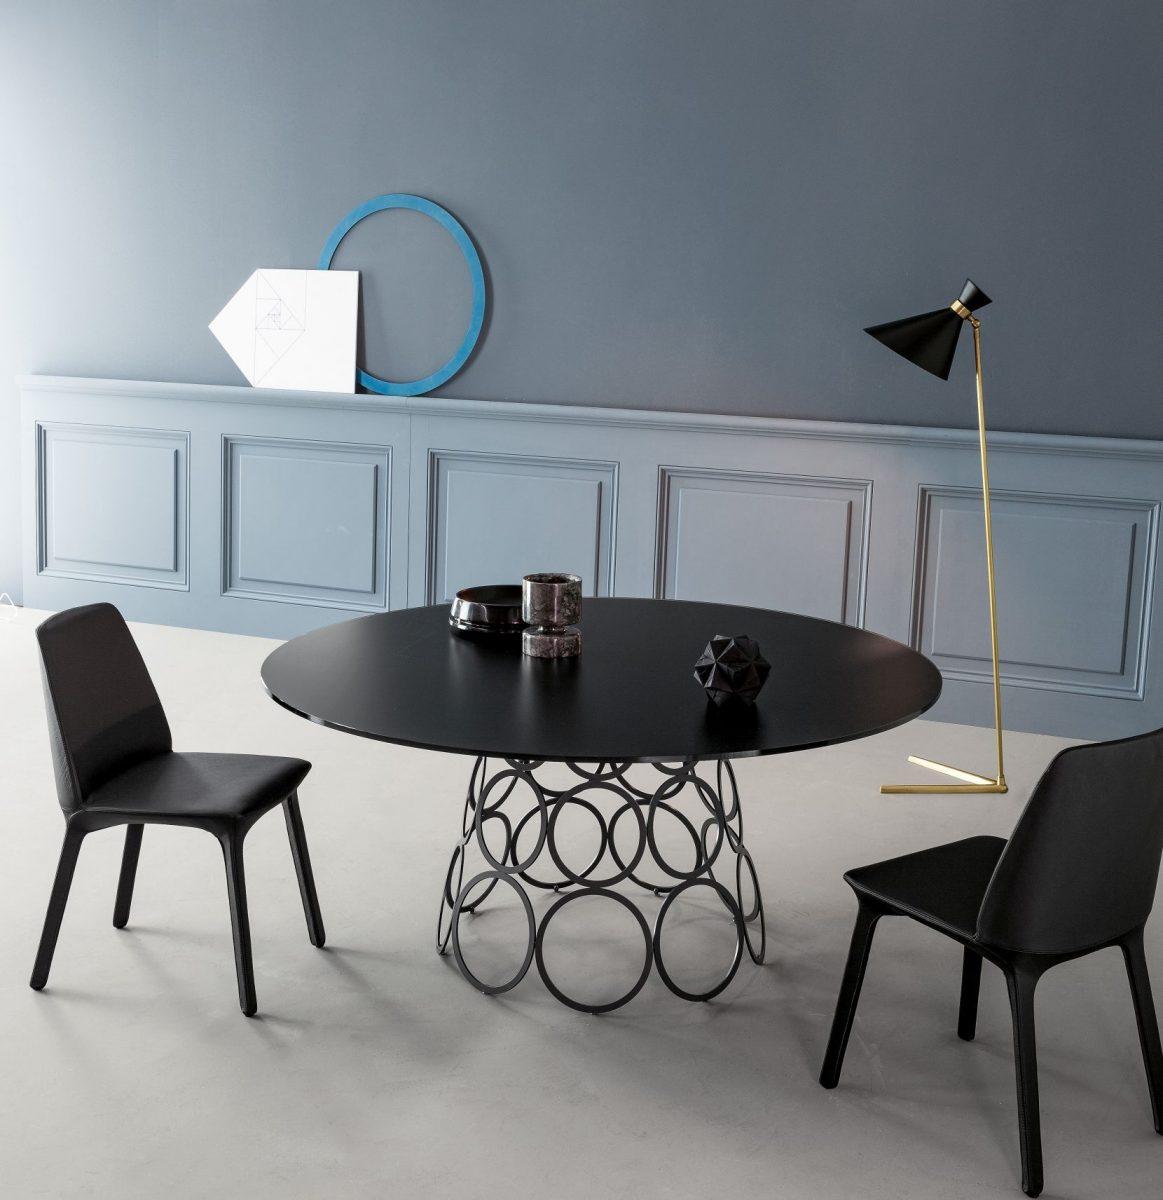 16go-modern-furniturebonaldo-hulahoop-dining-table-1200x1200.jpg